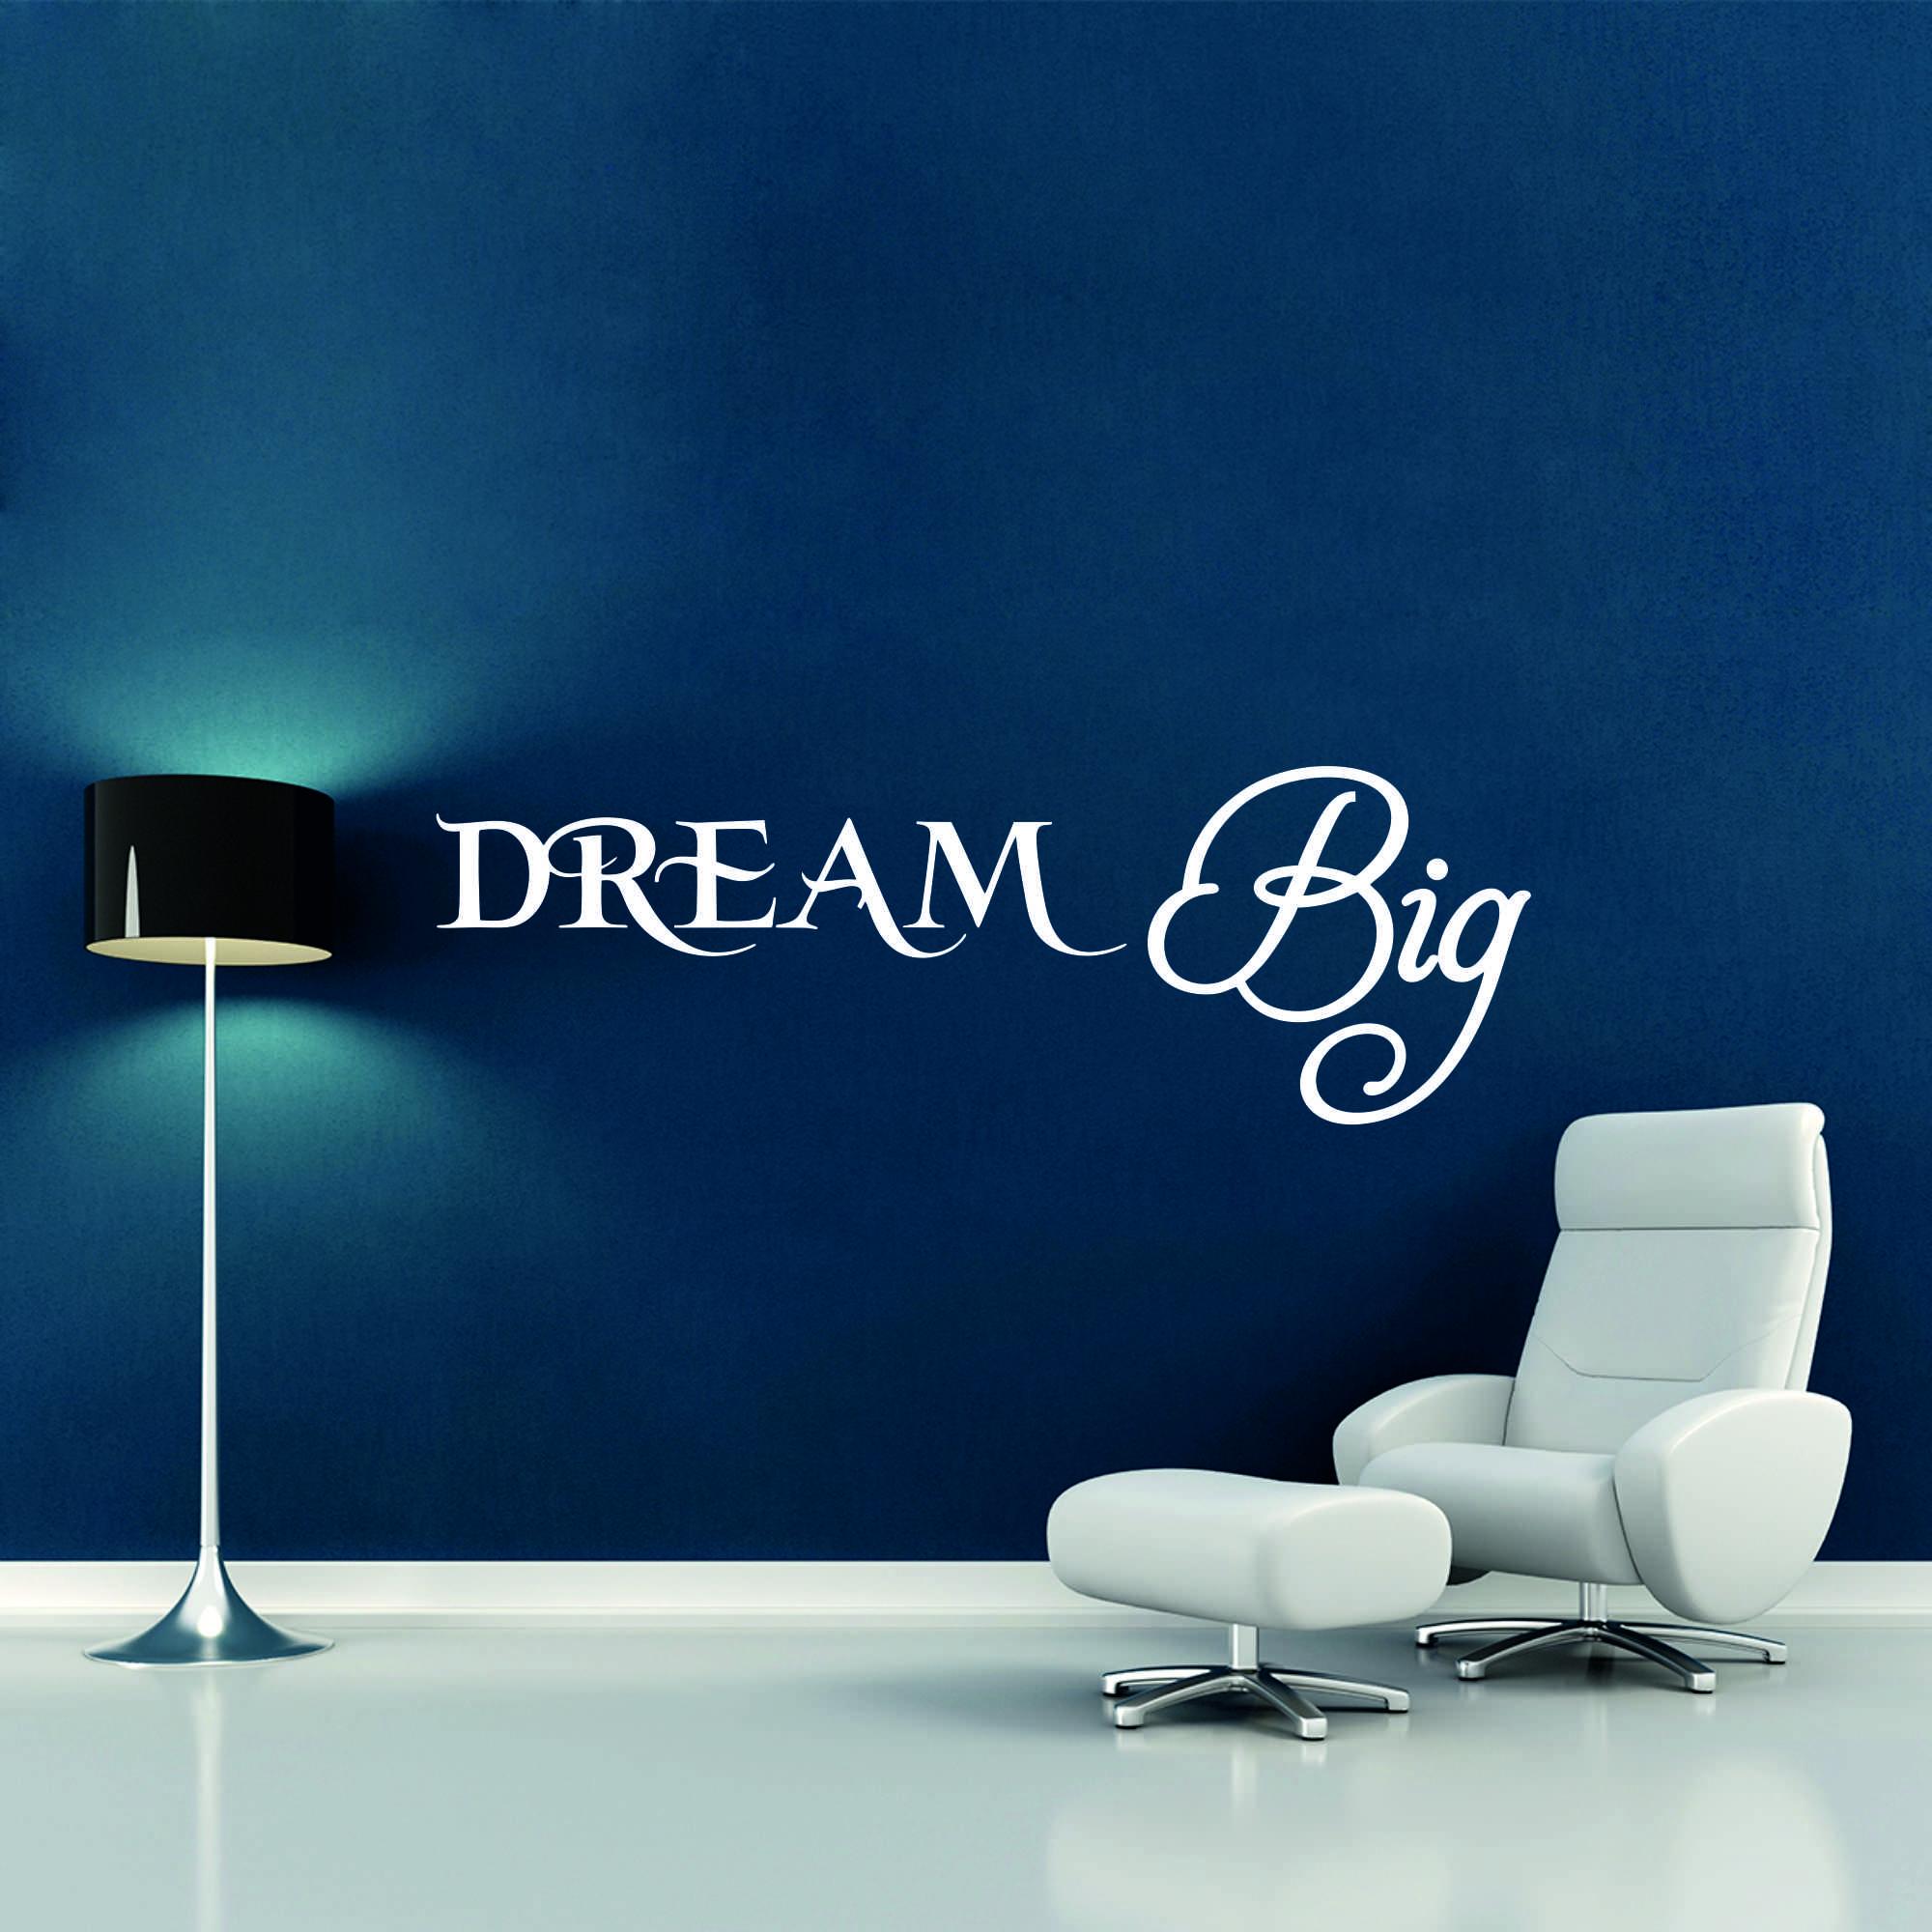 Samolepka na zeď - Dream Big nápis - 60x20 cm - PopyDesign